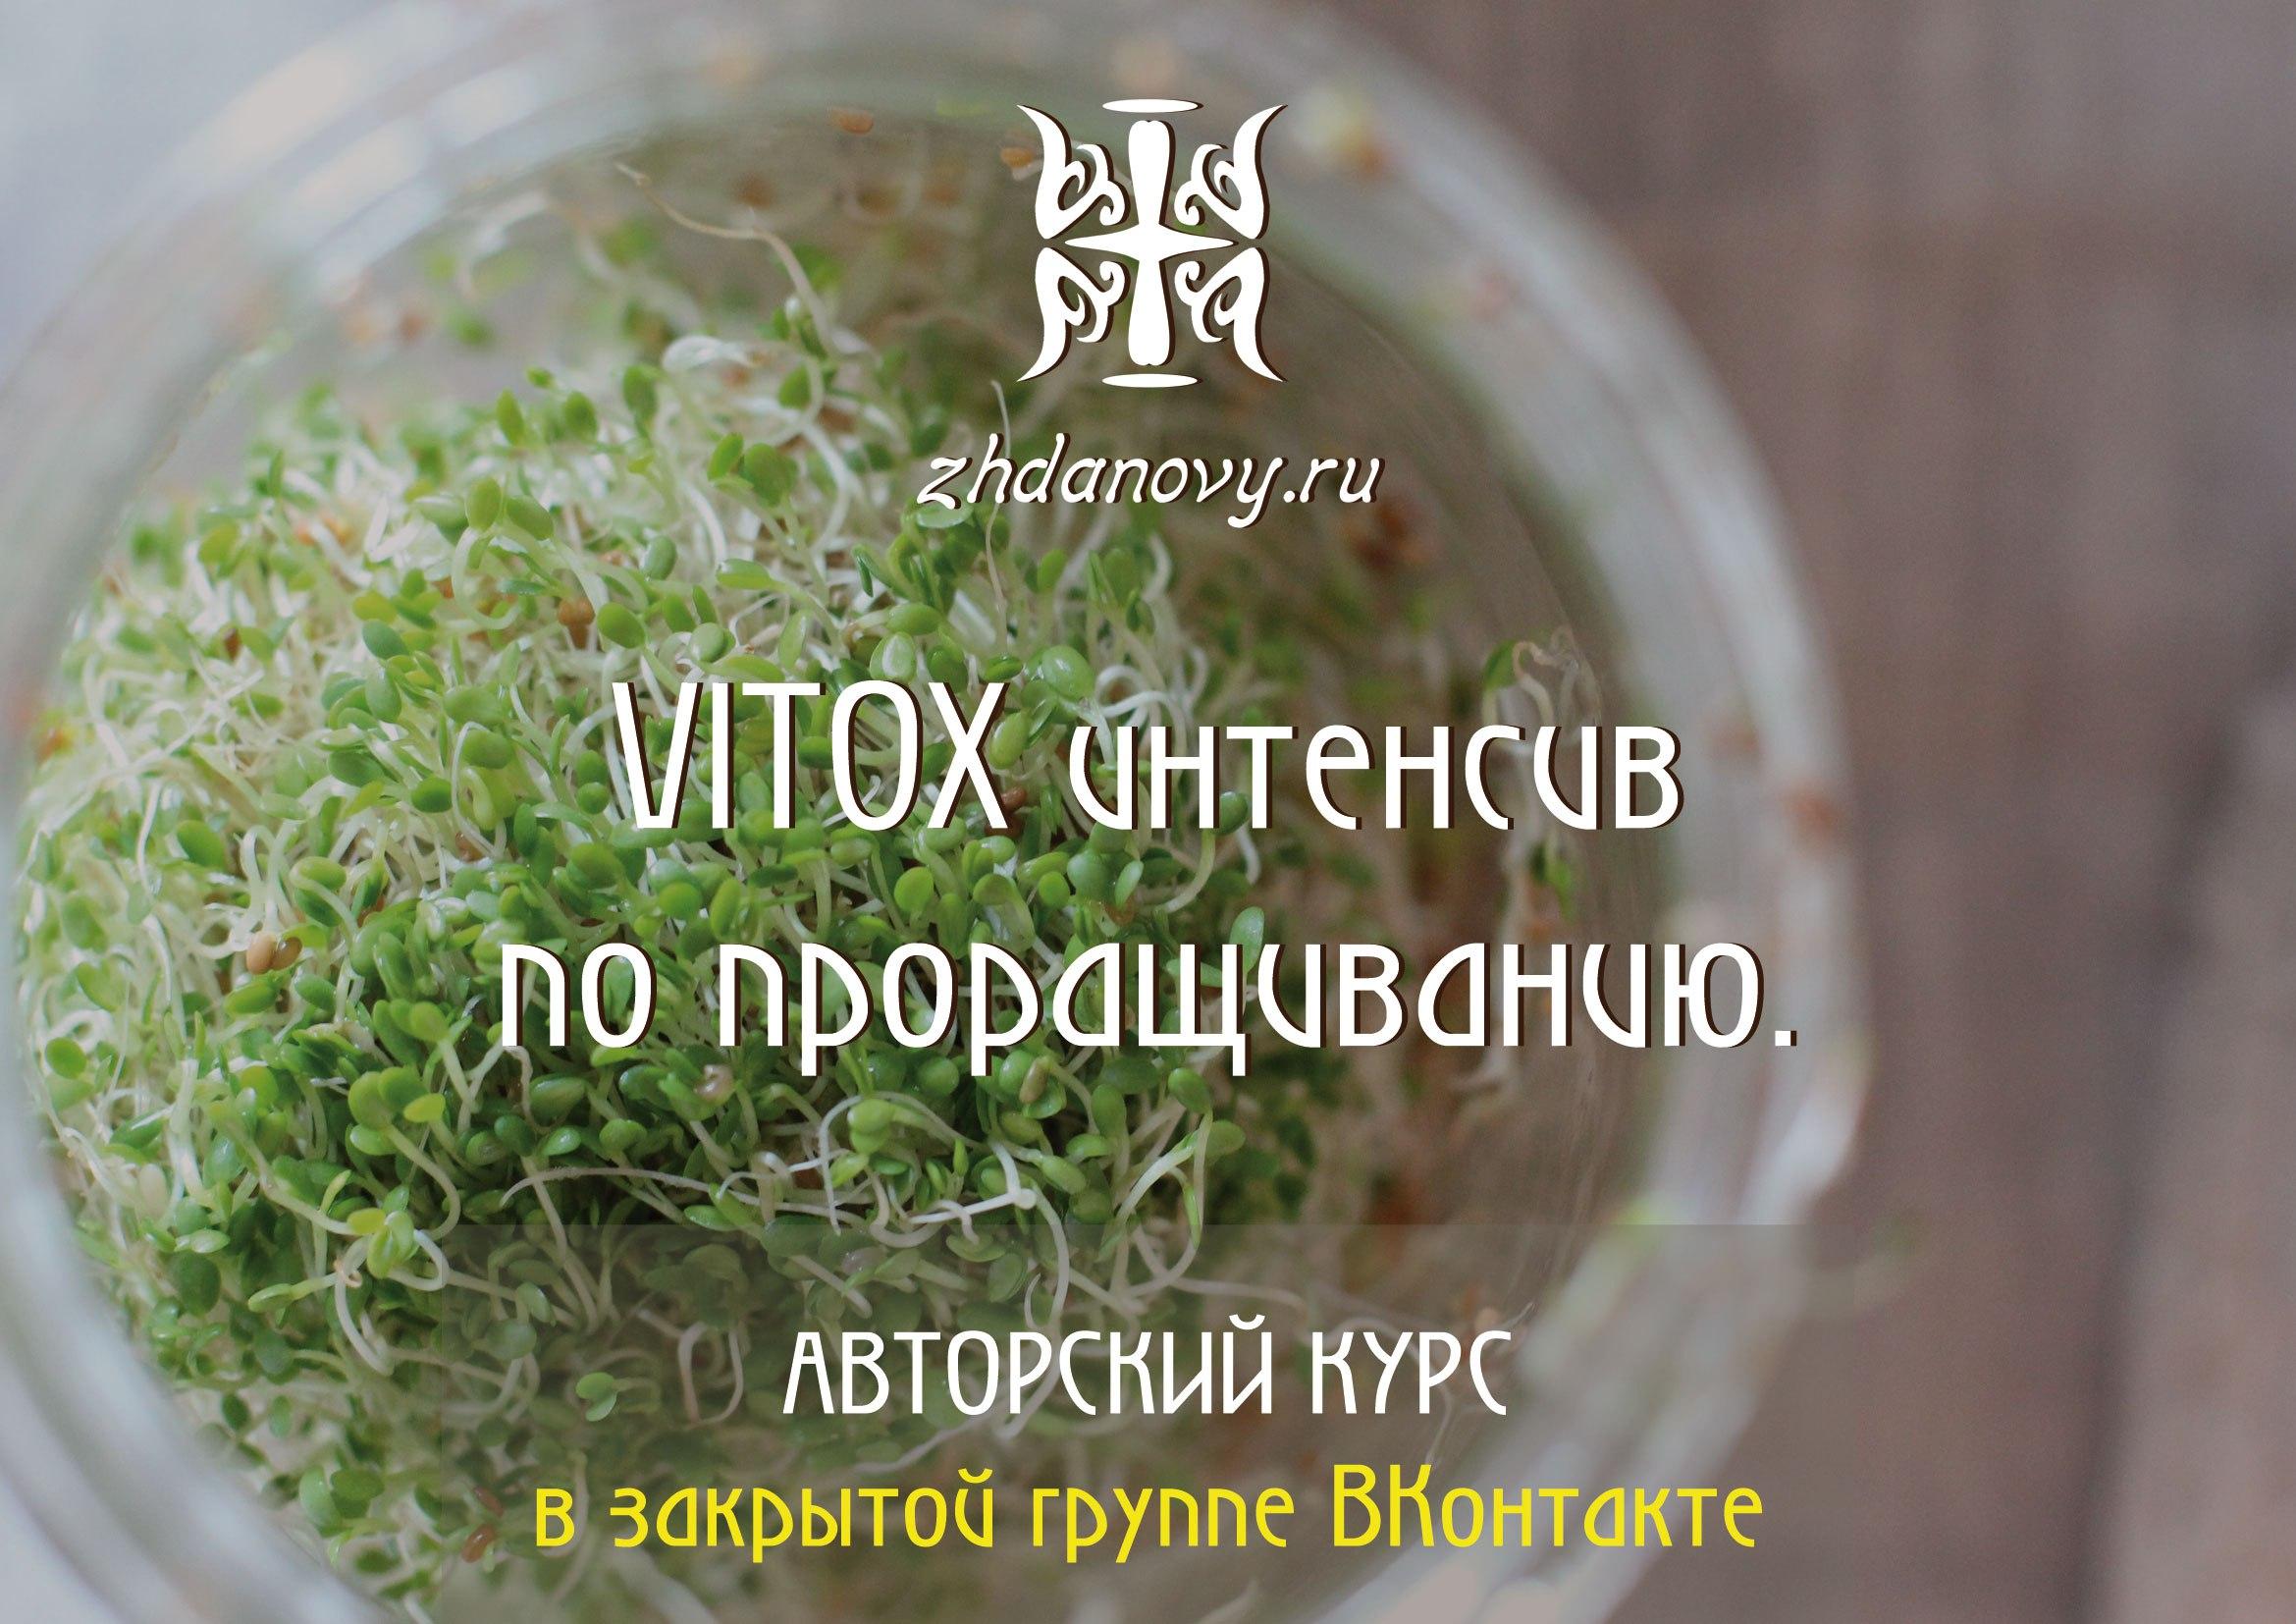 VITOX интенсив по проращиванию